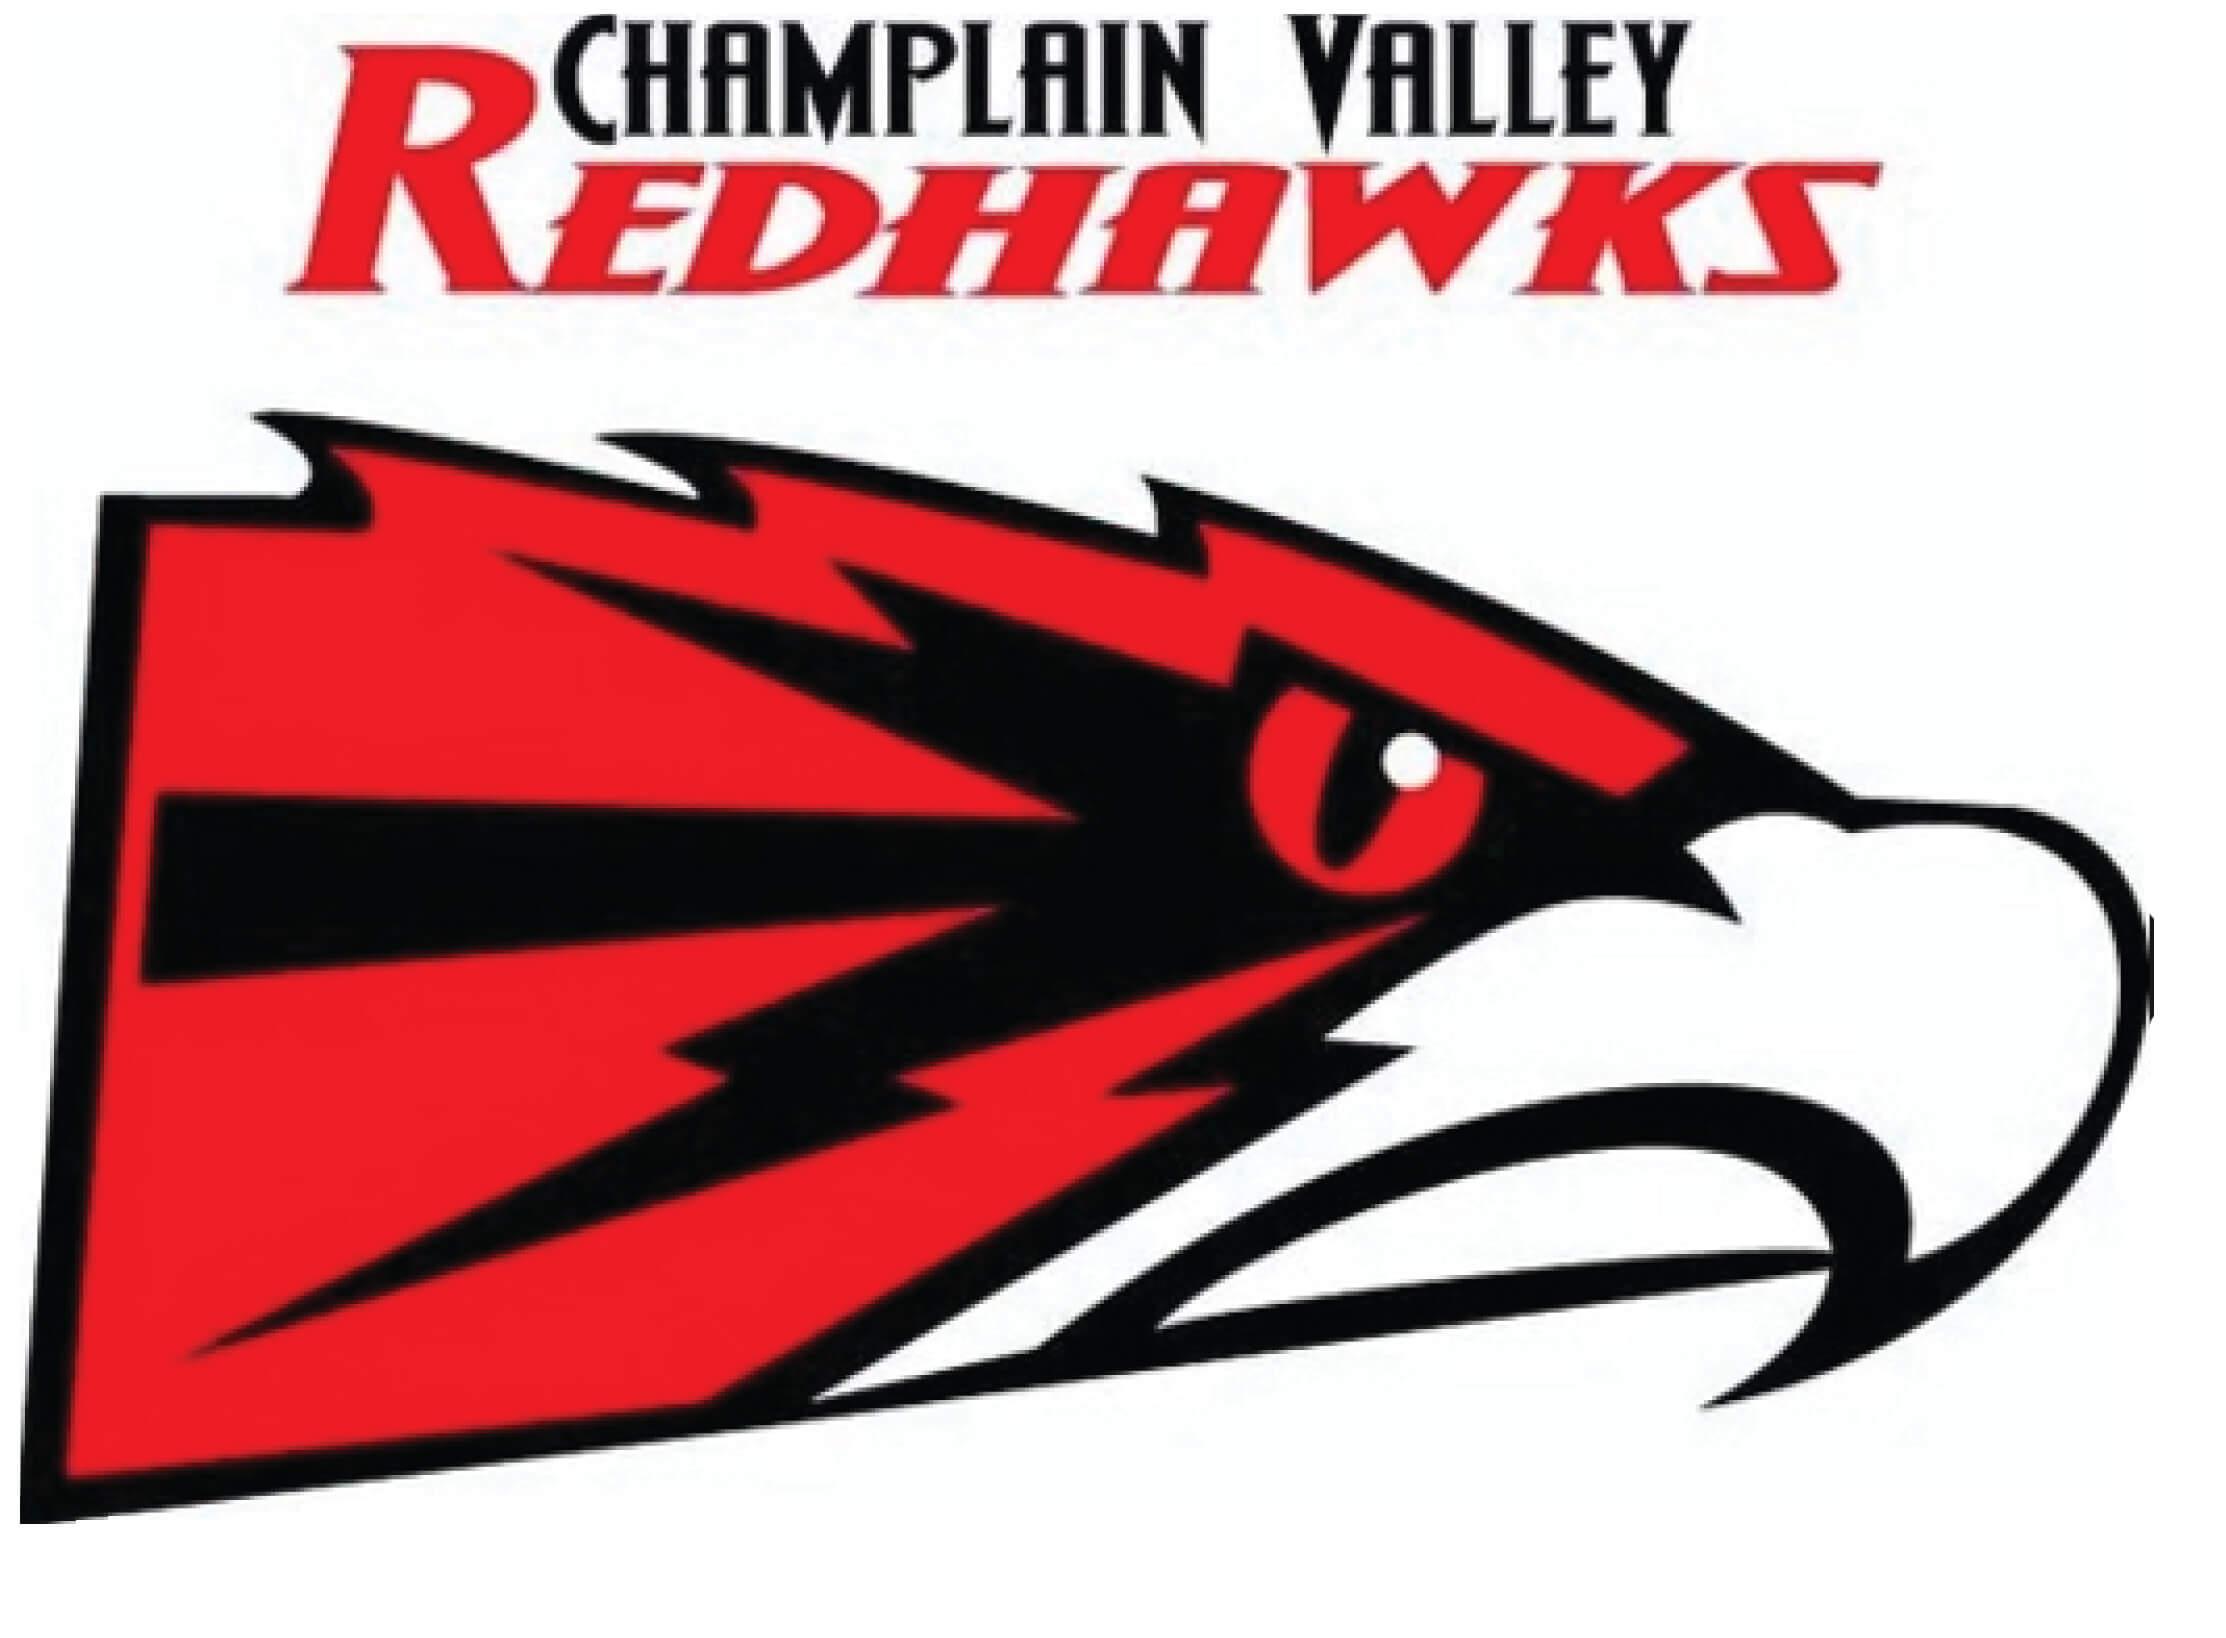 CVU Redhawks